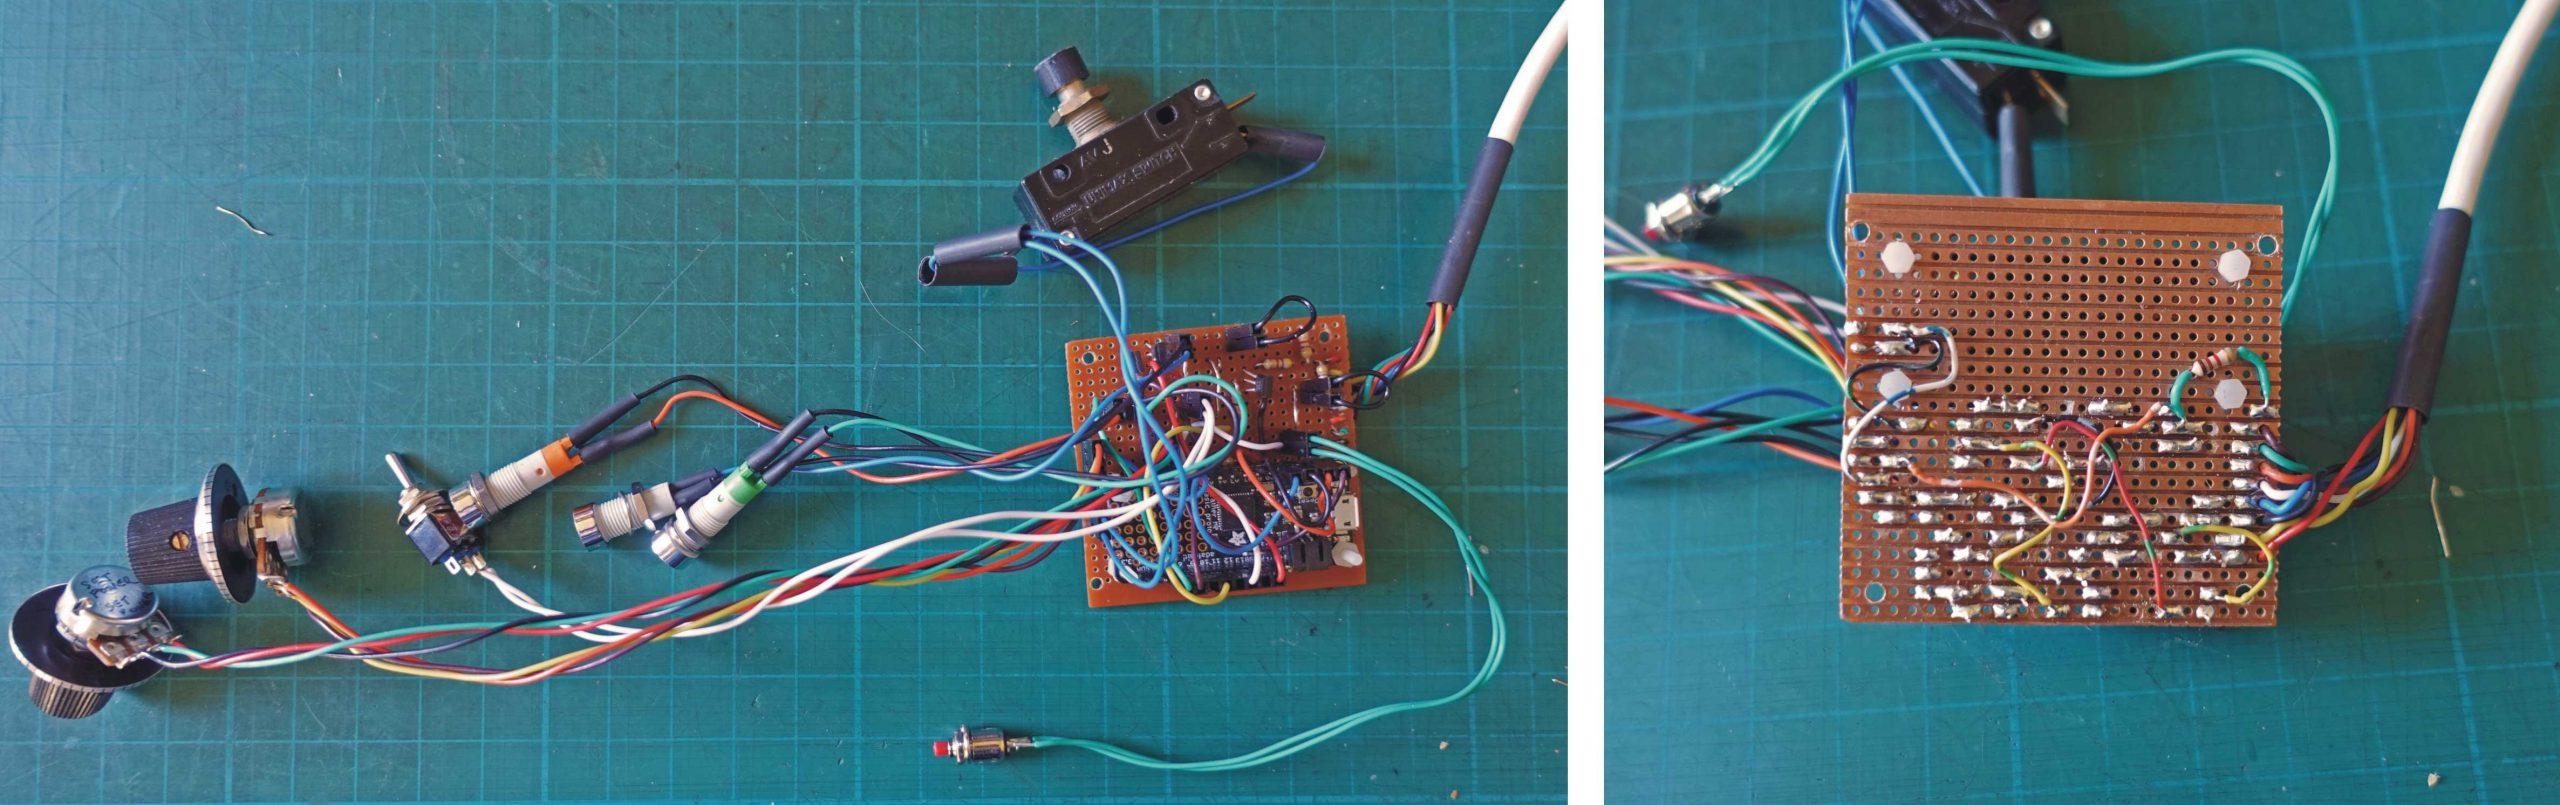 Laser management circuit